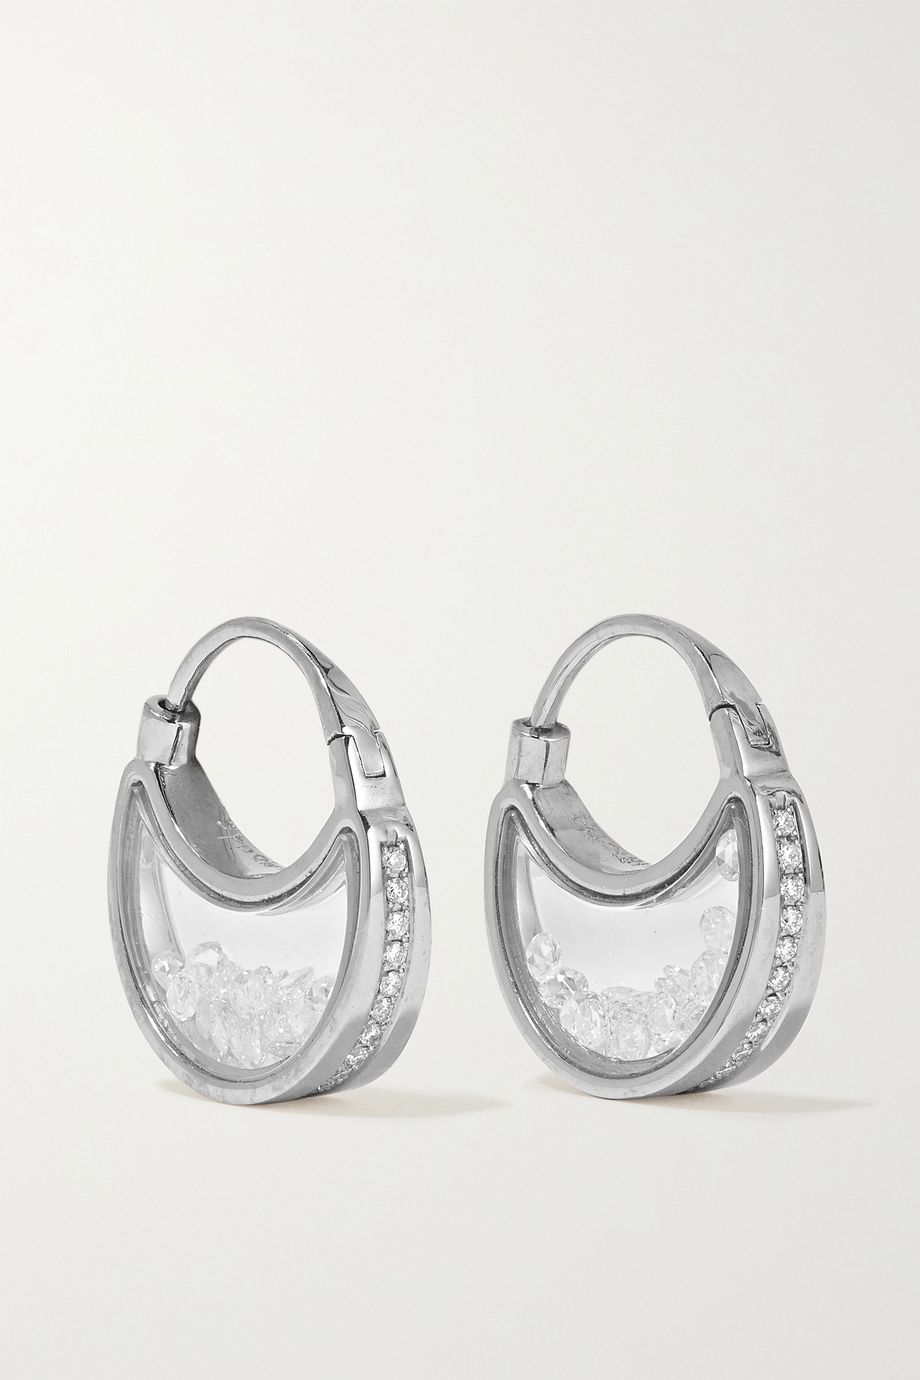 Moritz Glik 18-karat gray gold palladium, sapphire crystal and diamond earrings